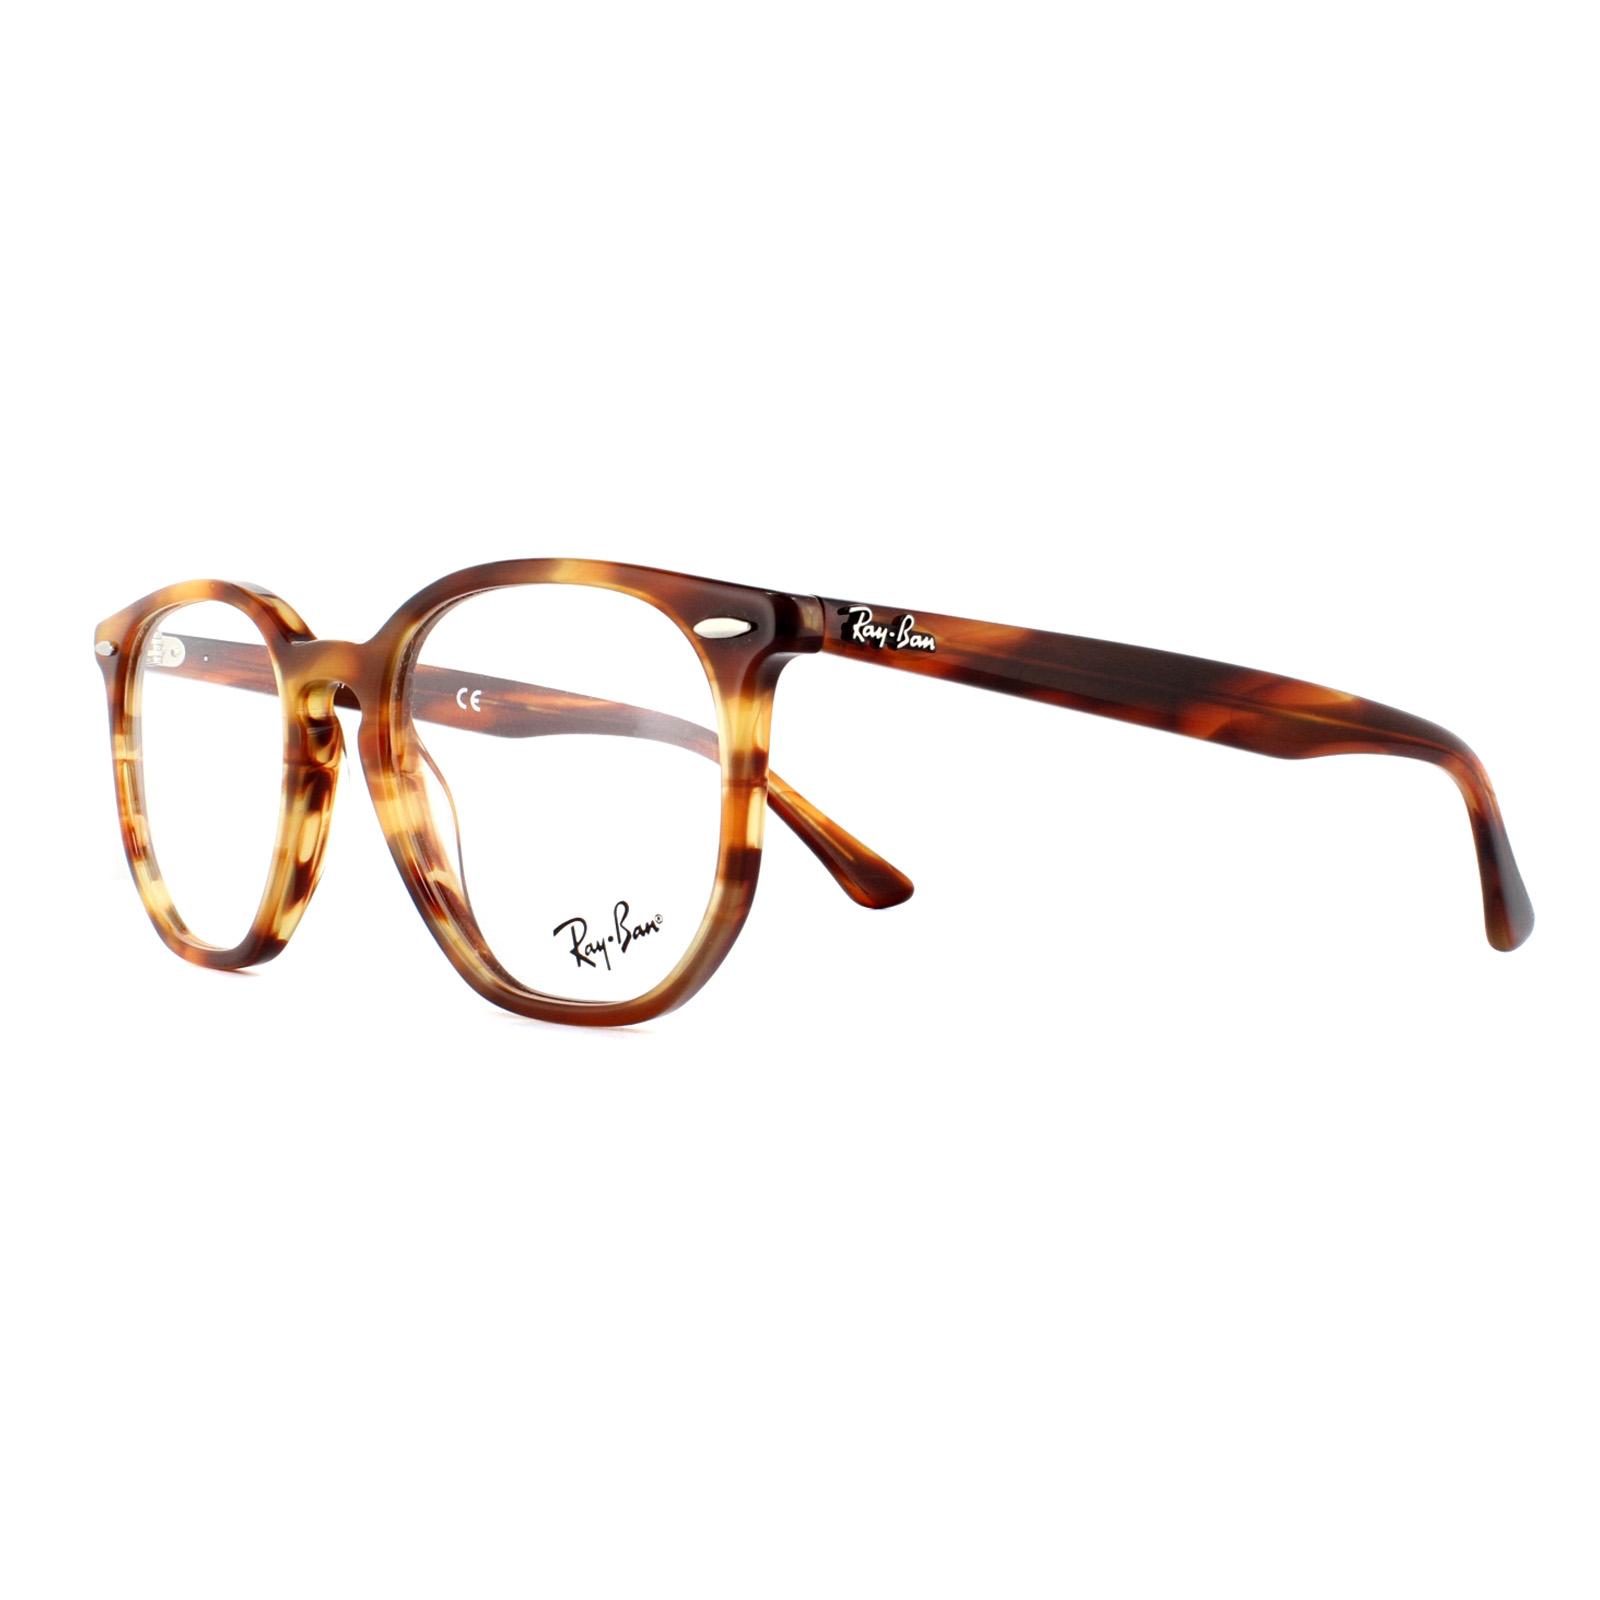 93268d16b0 Cheap Ray-Ban 7151 Hexagonal Glasses Frames - Discounted Sunglasses